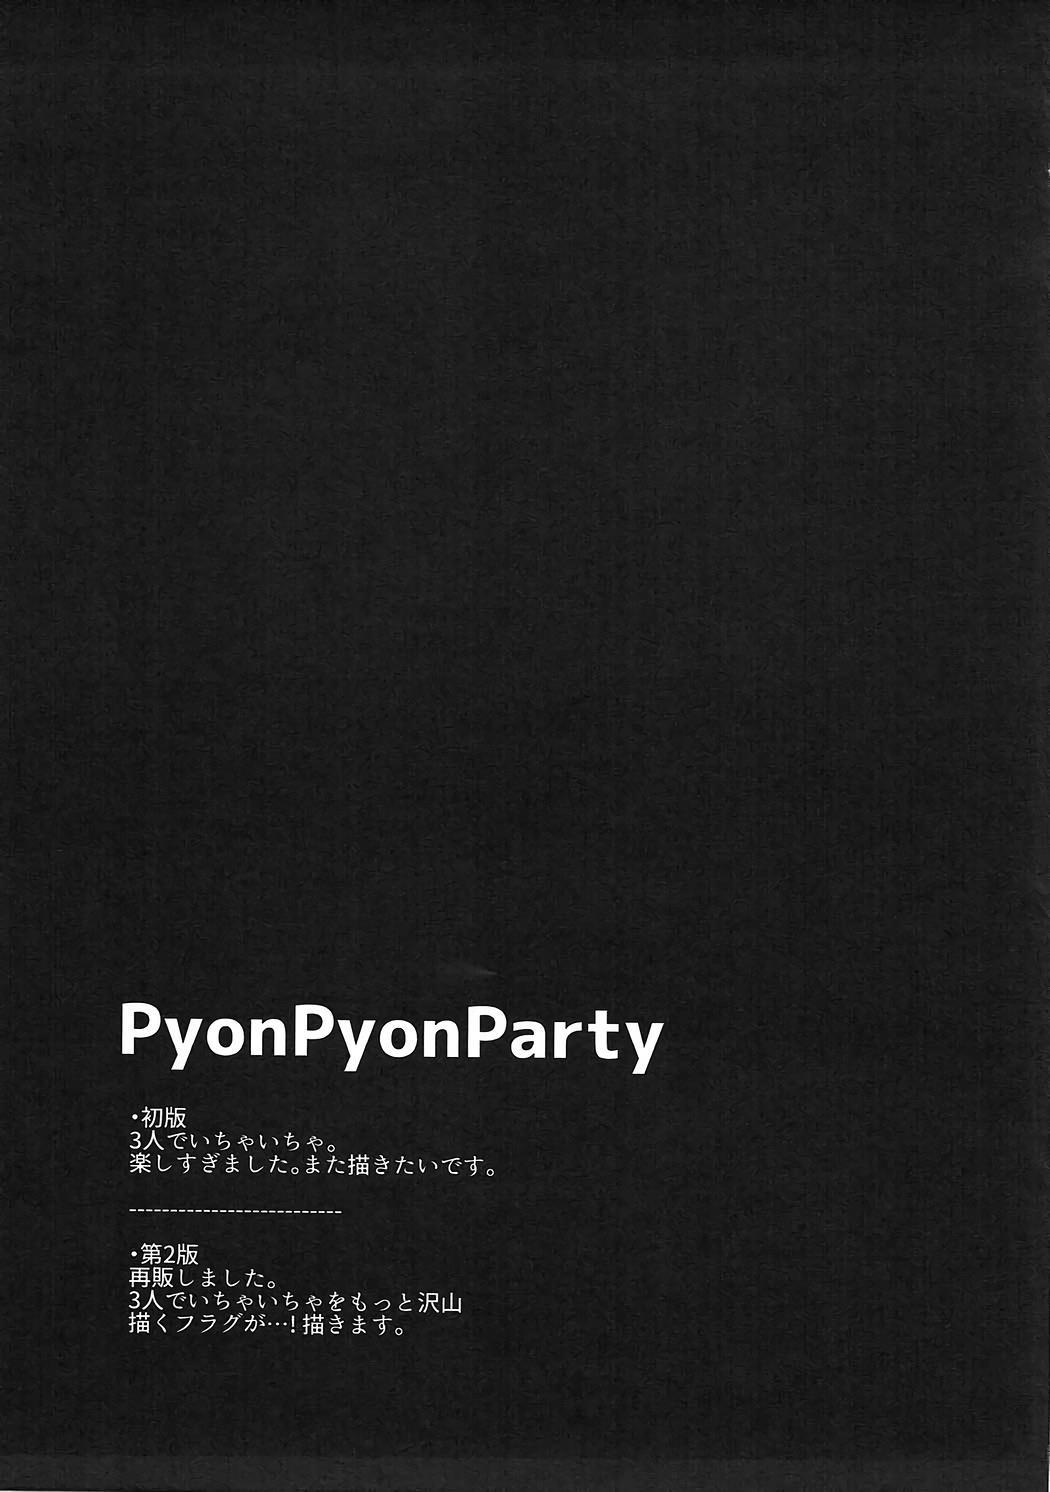 PyonPyonParty 11